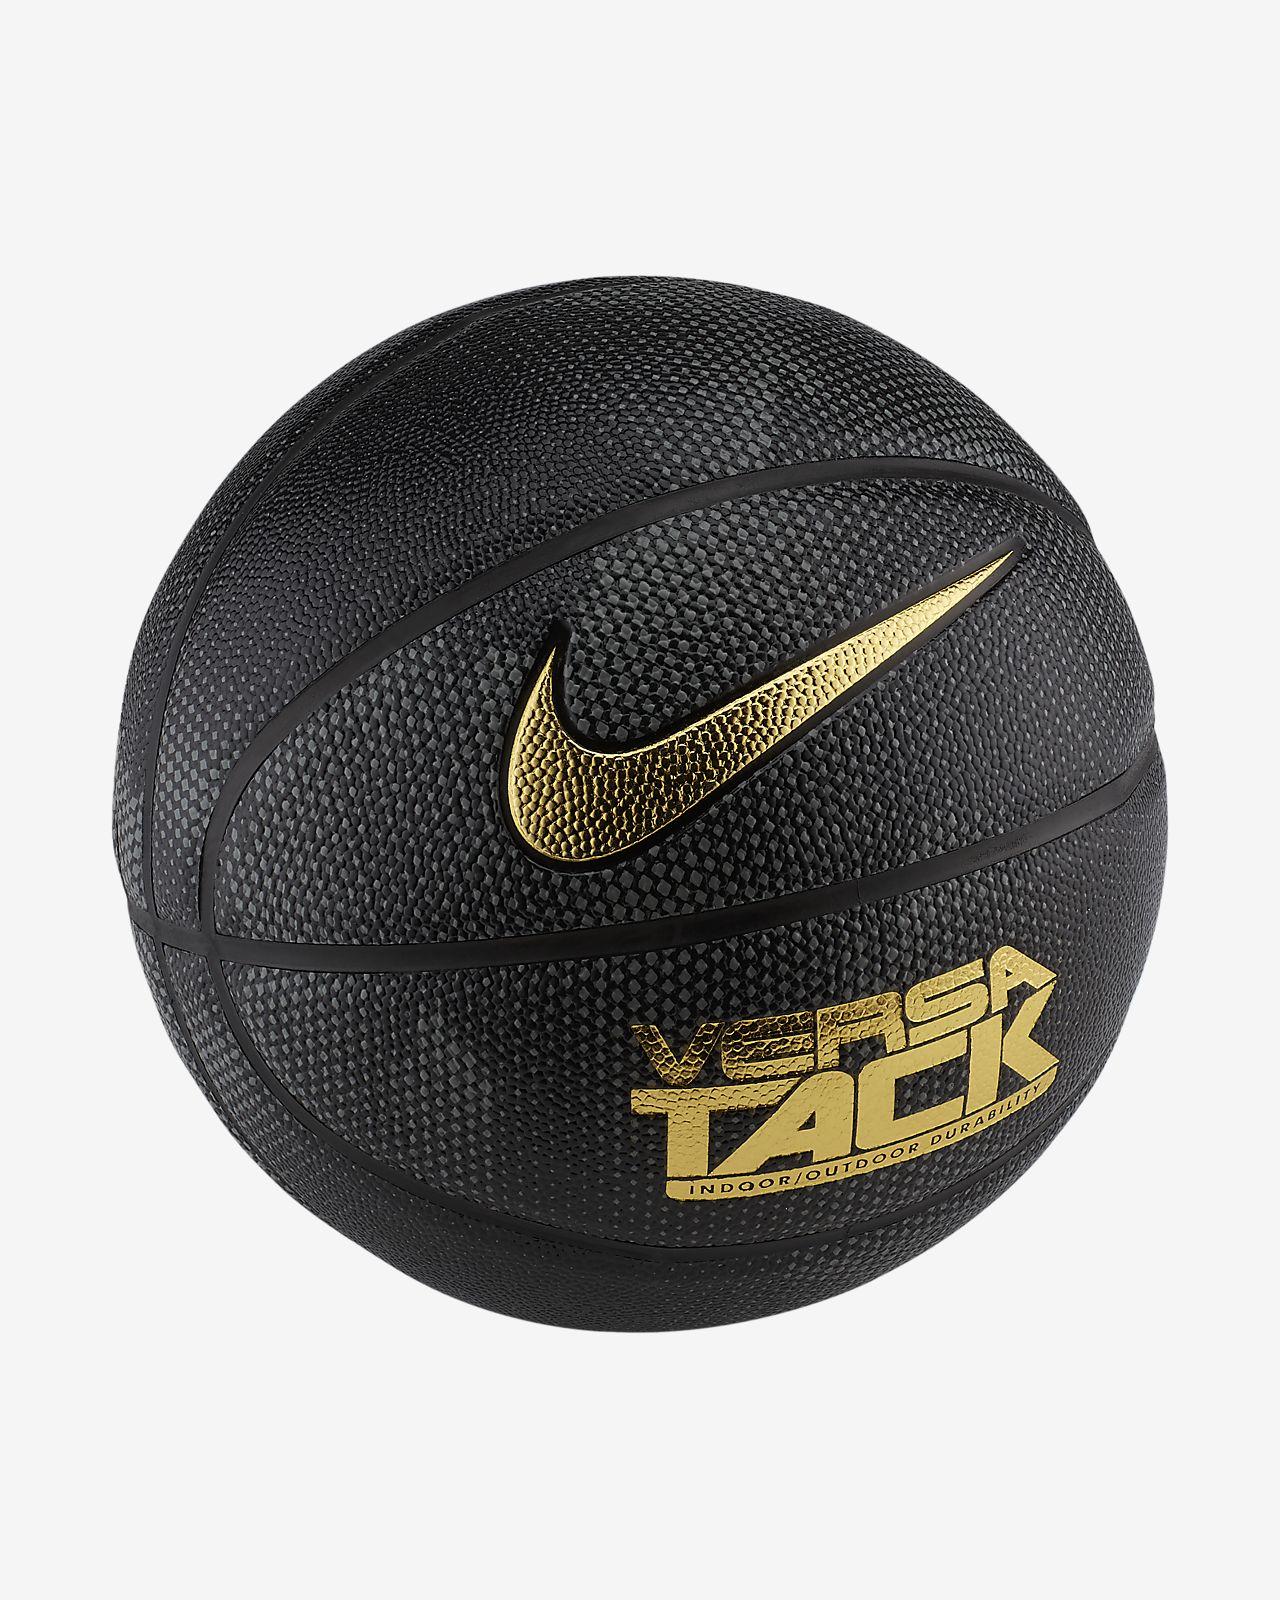 31e2337b Piłka do koszykówki Nike Versa Tack 8P. Nike.com PL